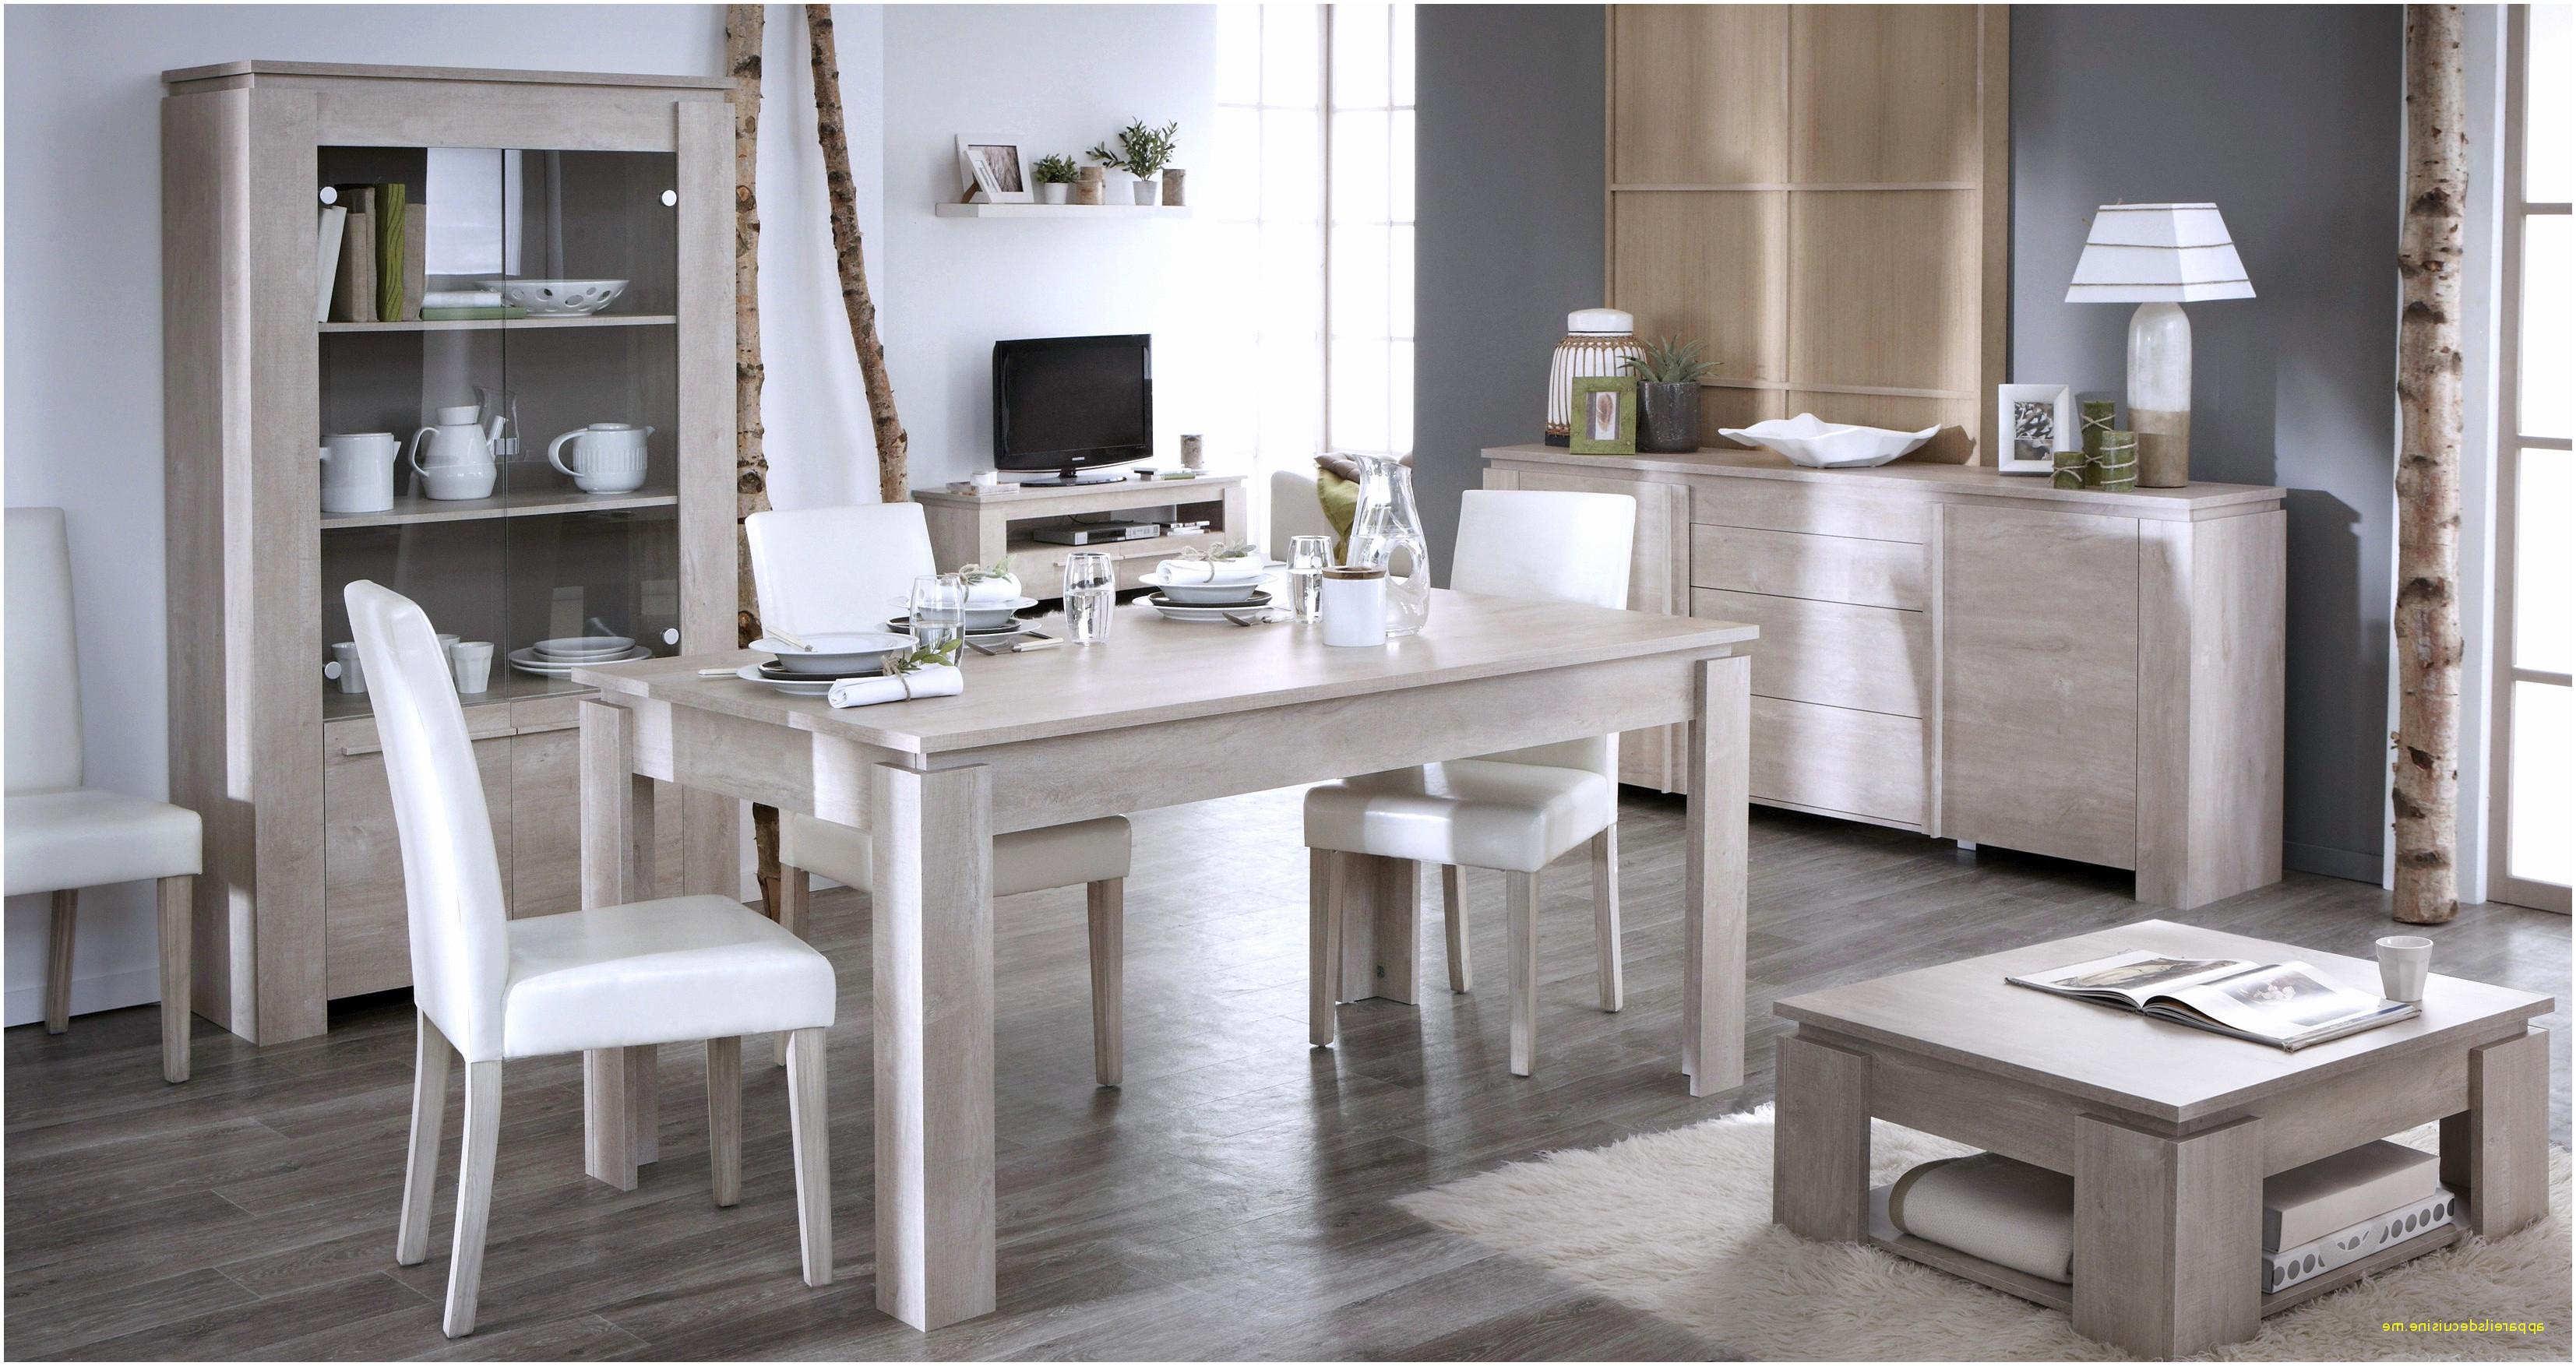 Table Salon Conforama Impressionnant Galerie 31 Bello Conforama Salones Ideas Interiores Del Hogar